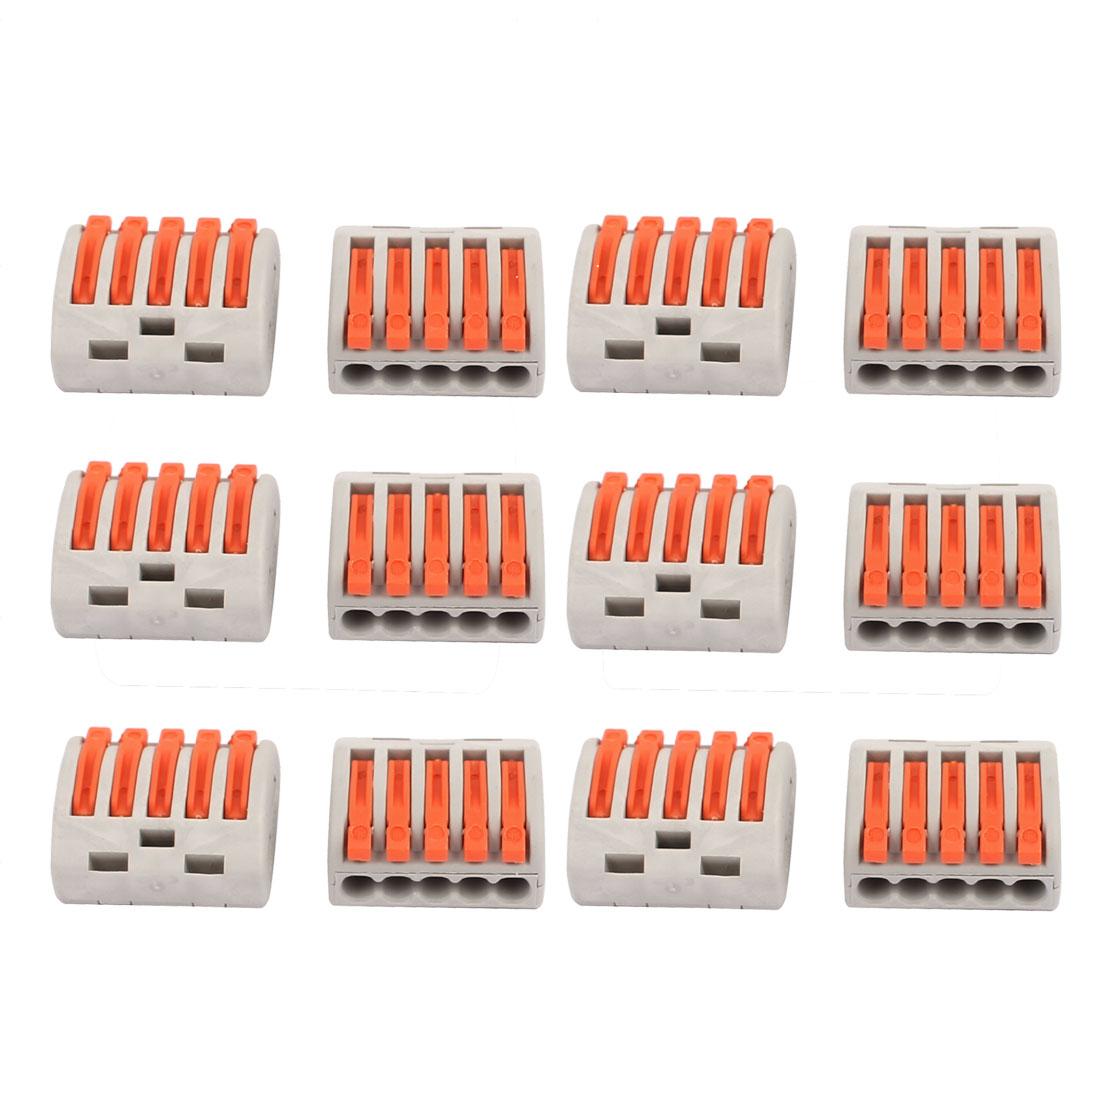 12 Pcs AC 250V 20A Lever Lock Clamp 5 Pins 5 Ports Terminal Block 0.75-2.5mm2 PCT-215 Orange